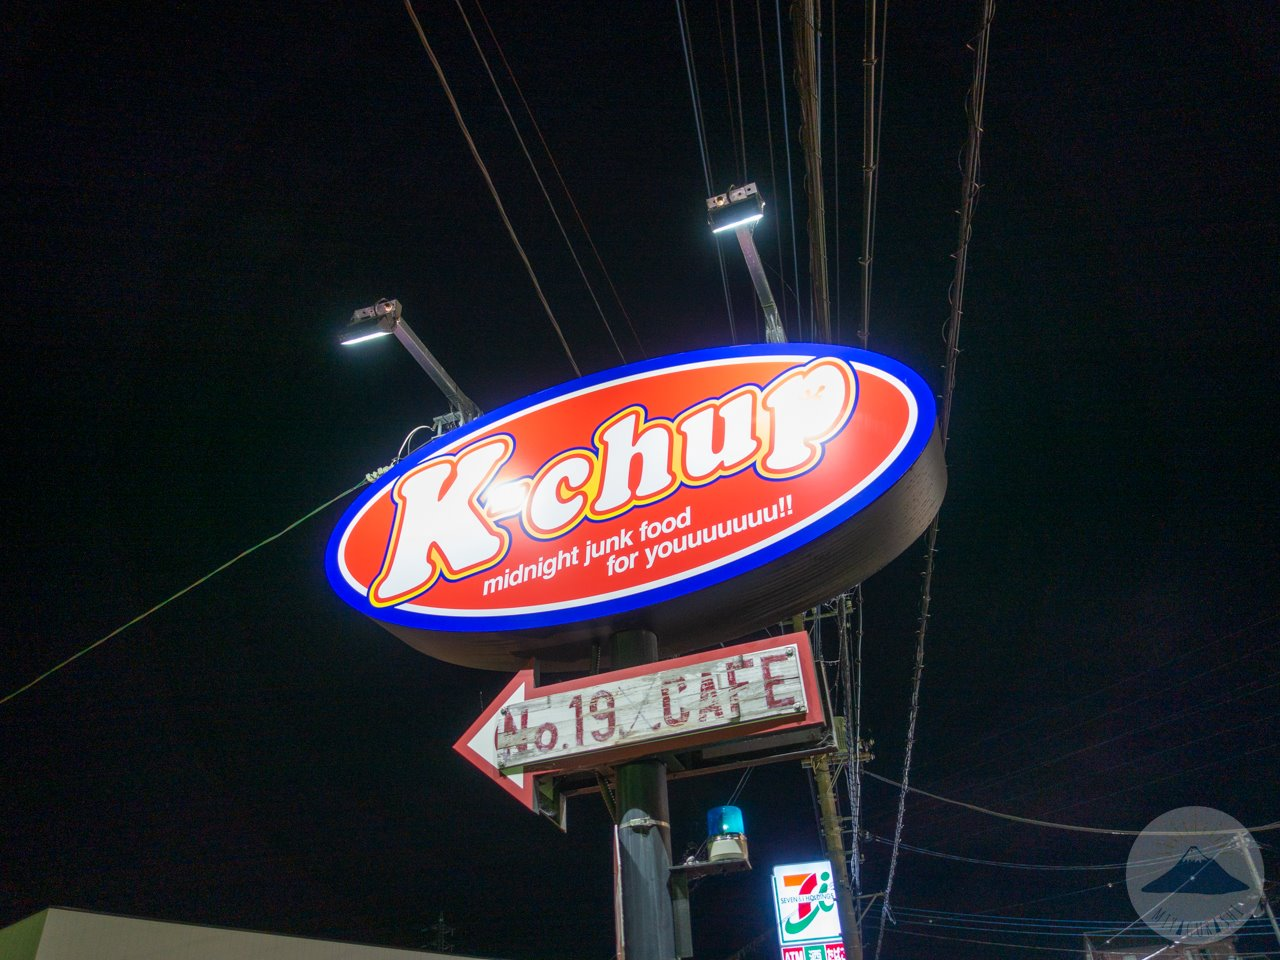 K-chupの看板